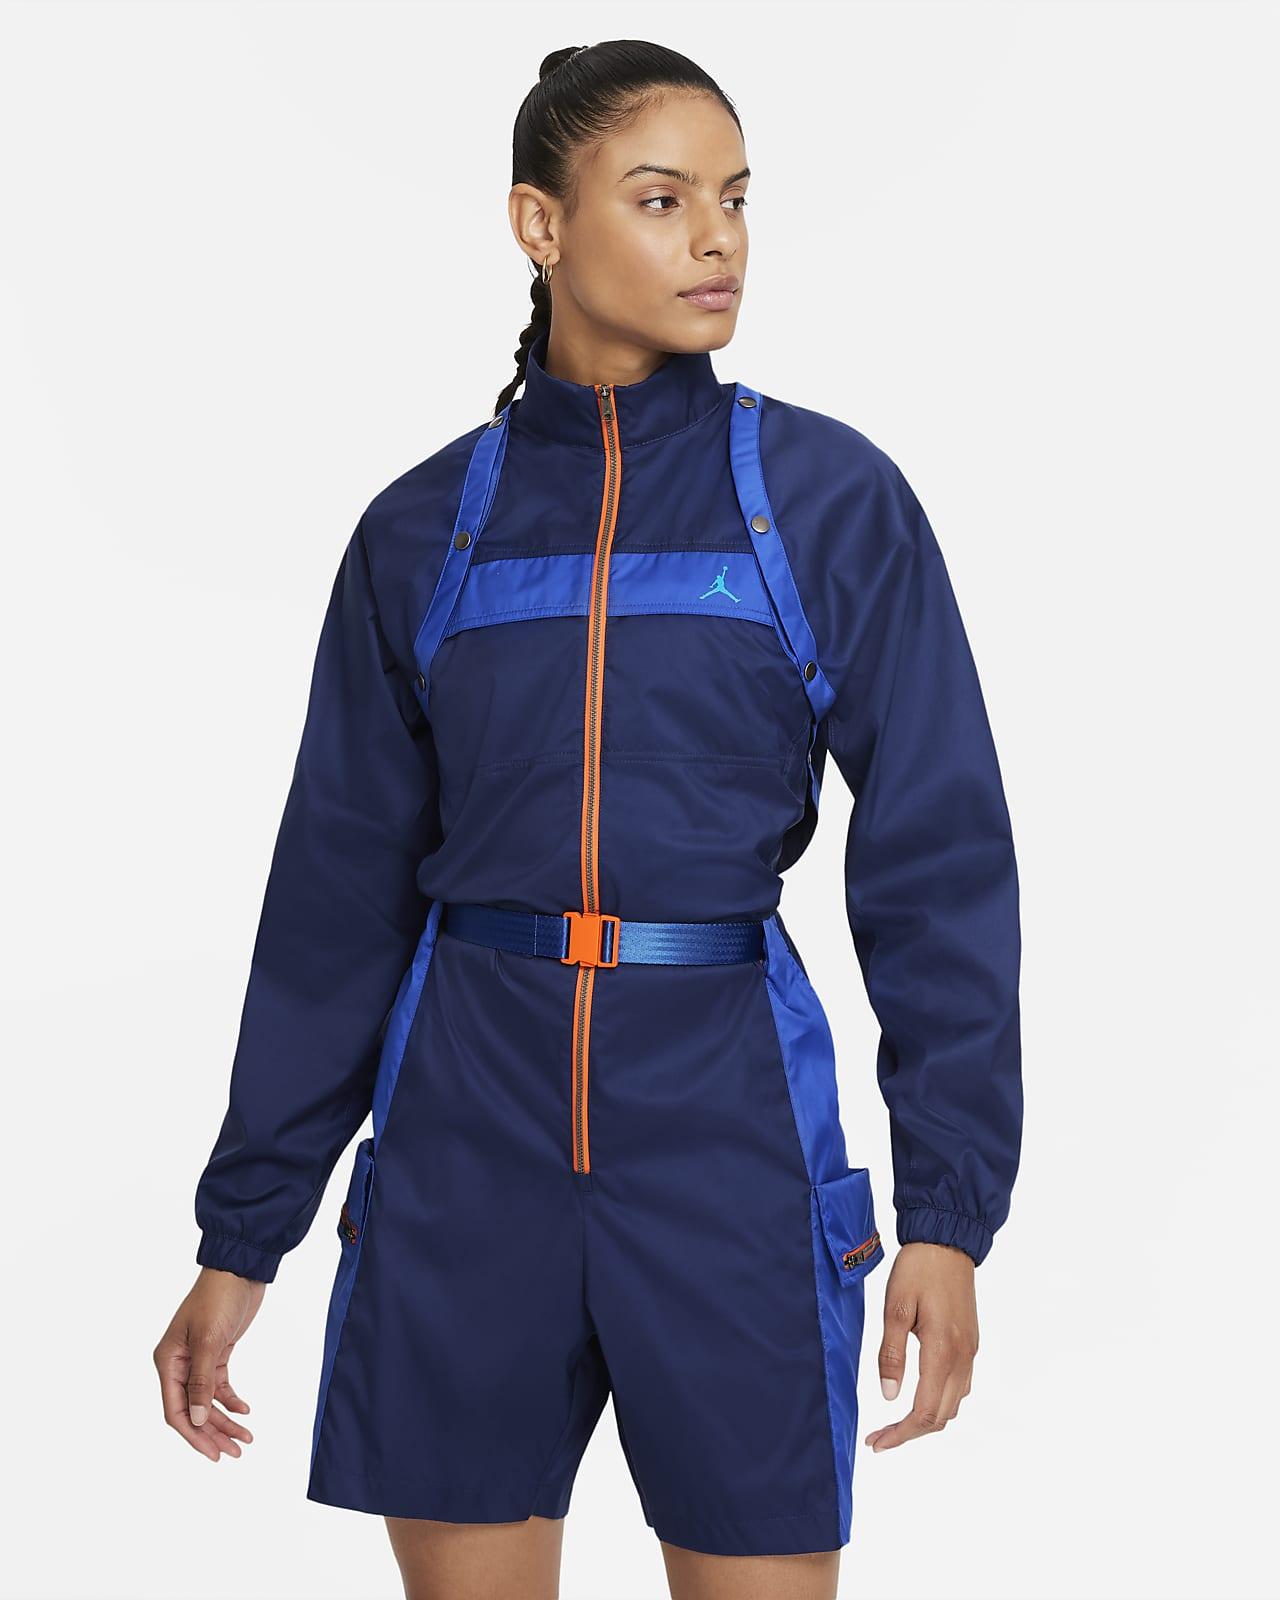 Jordan Next Utility Capsule Women's Flight Suit